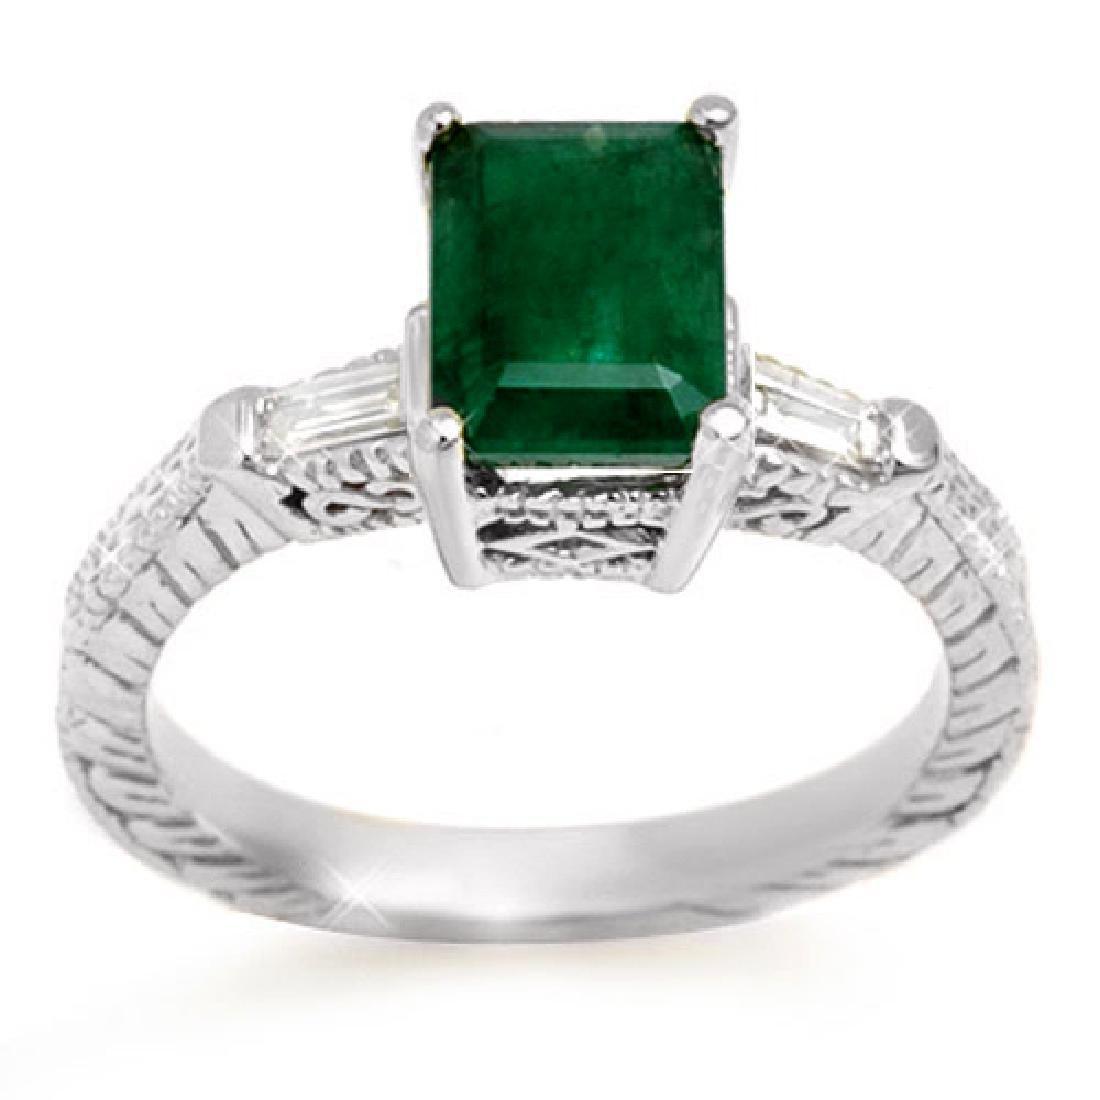 2.45 CTW Emerald & Diamond Ring 14K White Gold